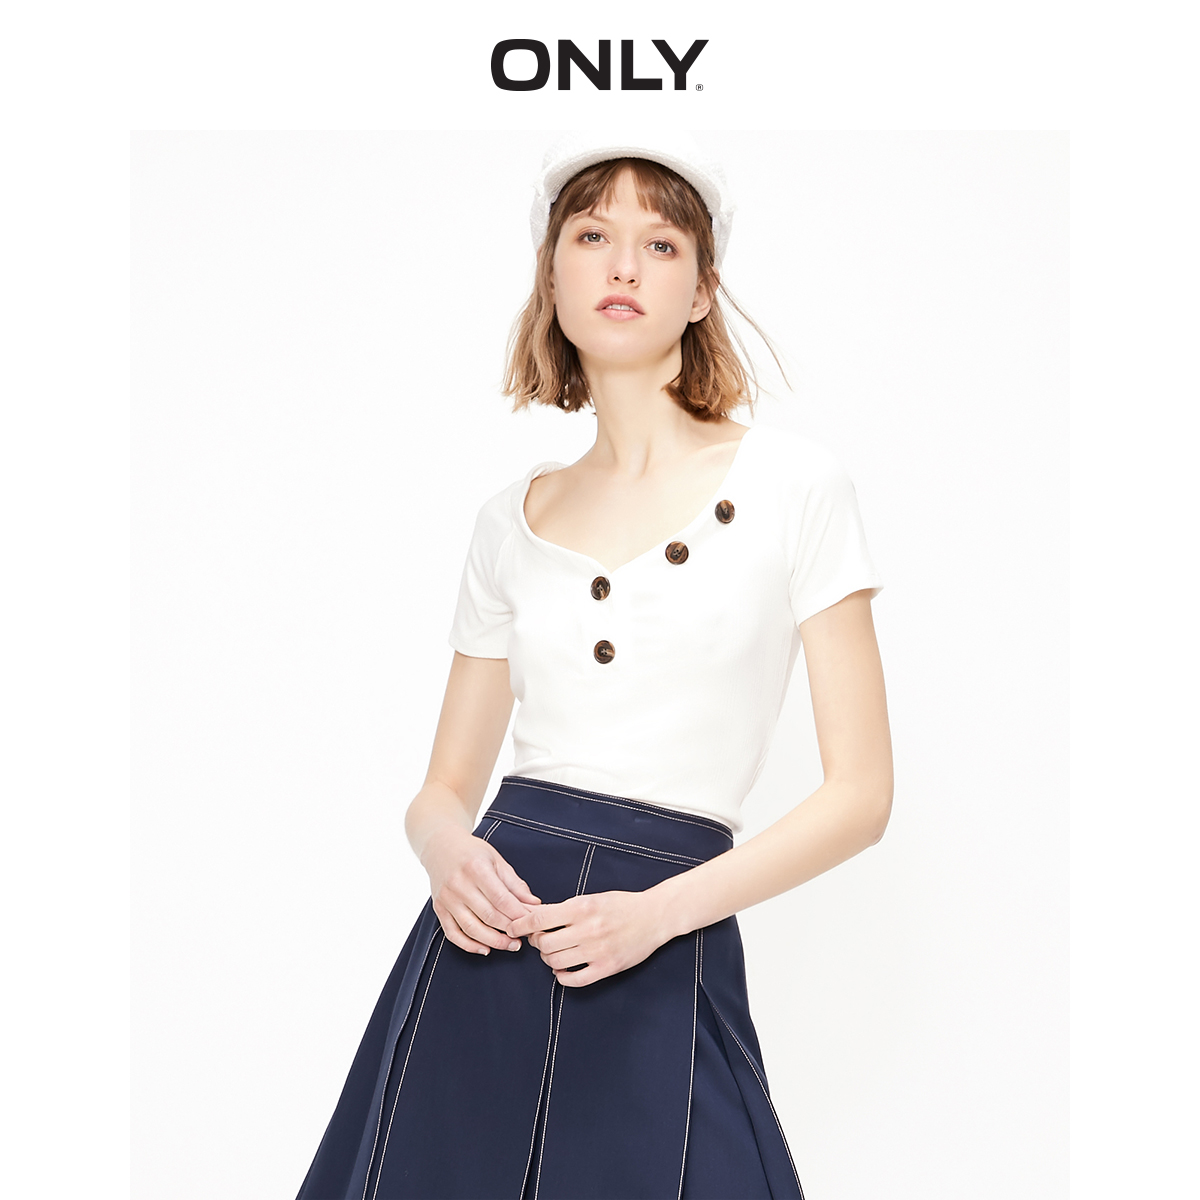 ONLY  Women's Slim Fit Stretch Low-cut V-neckline Short-sleeved Knit T-shirt | 119201587